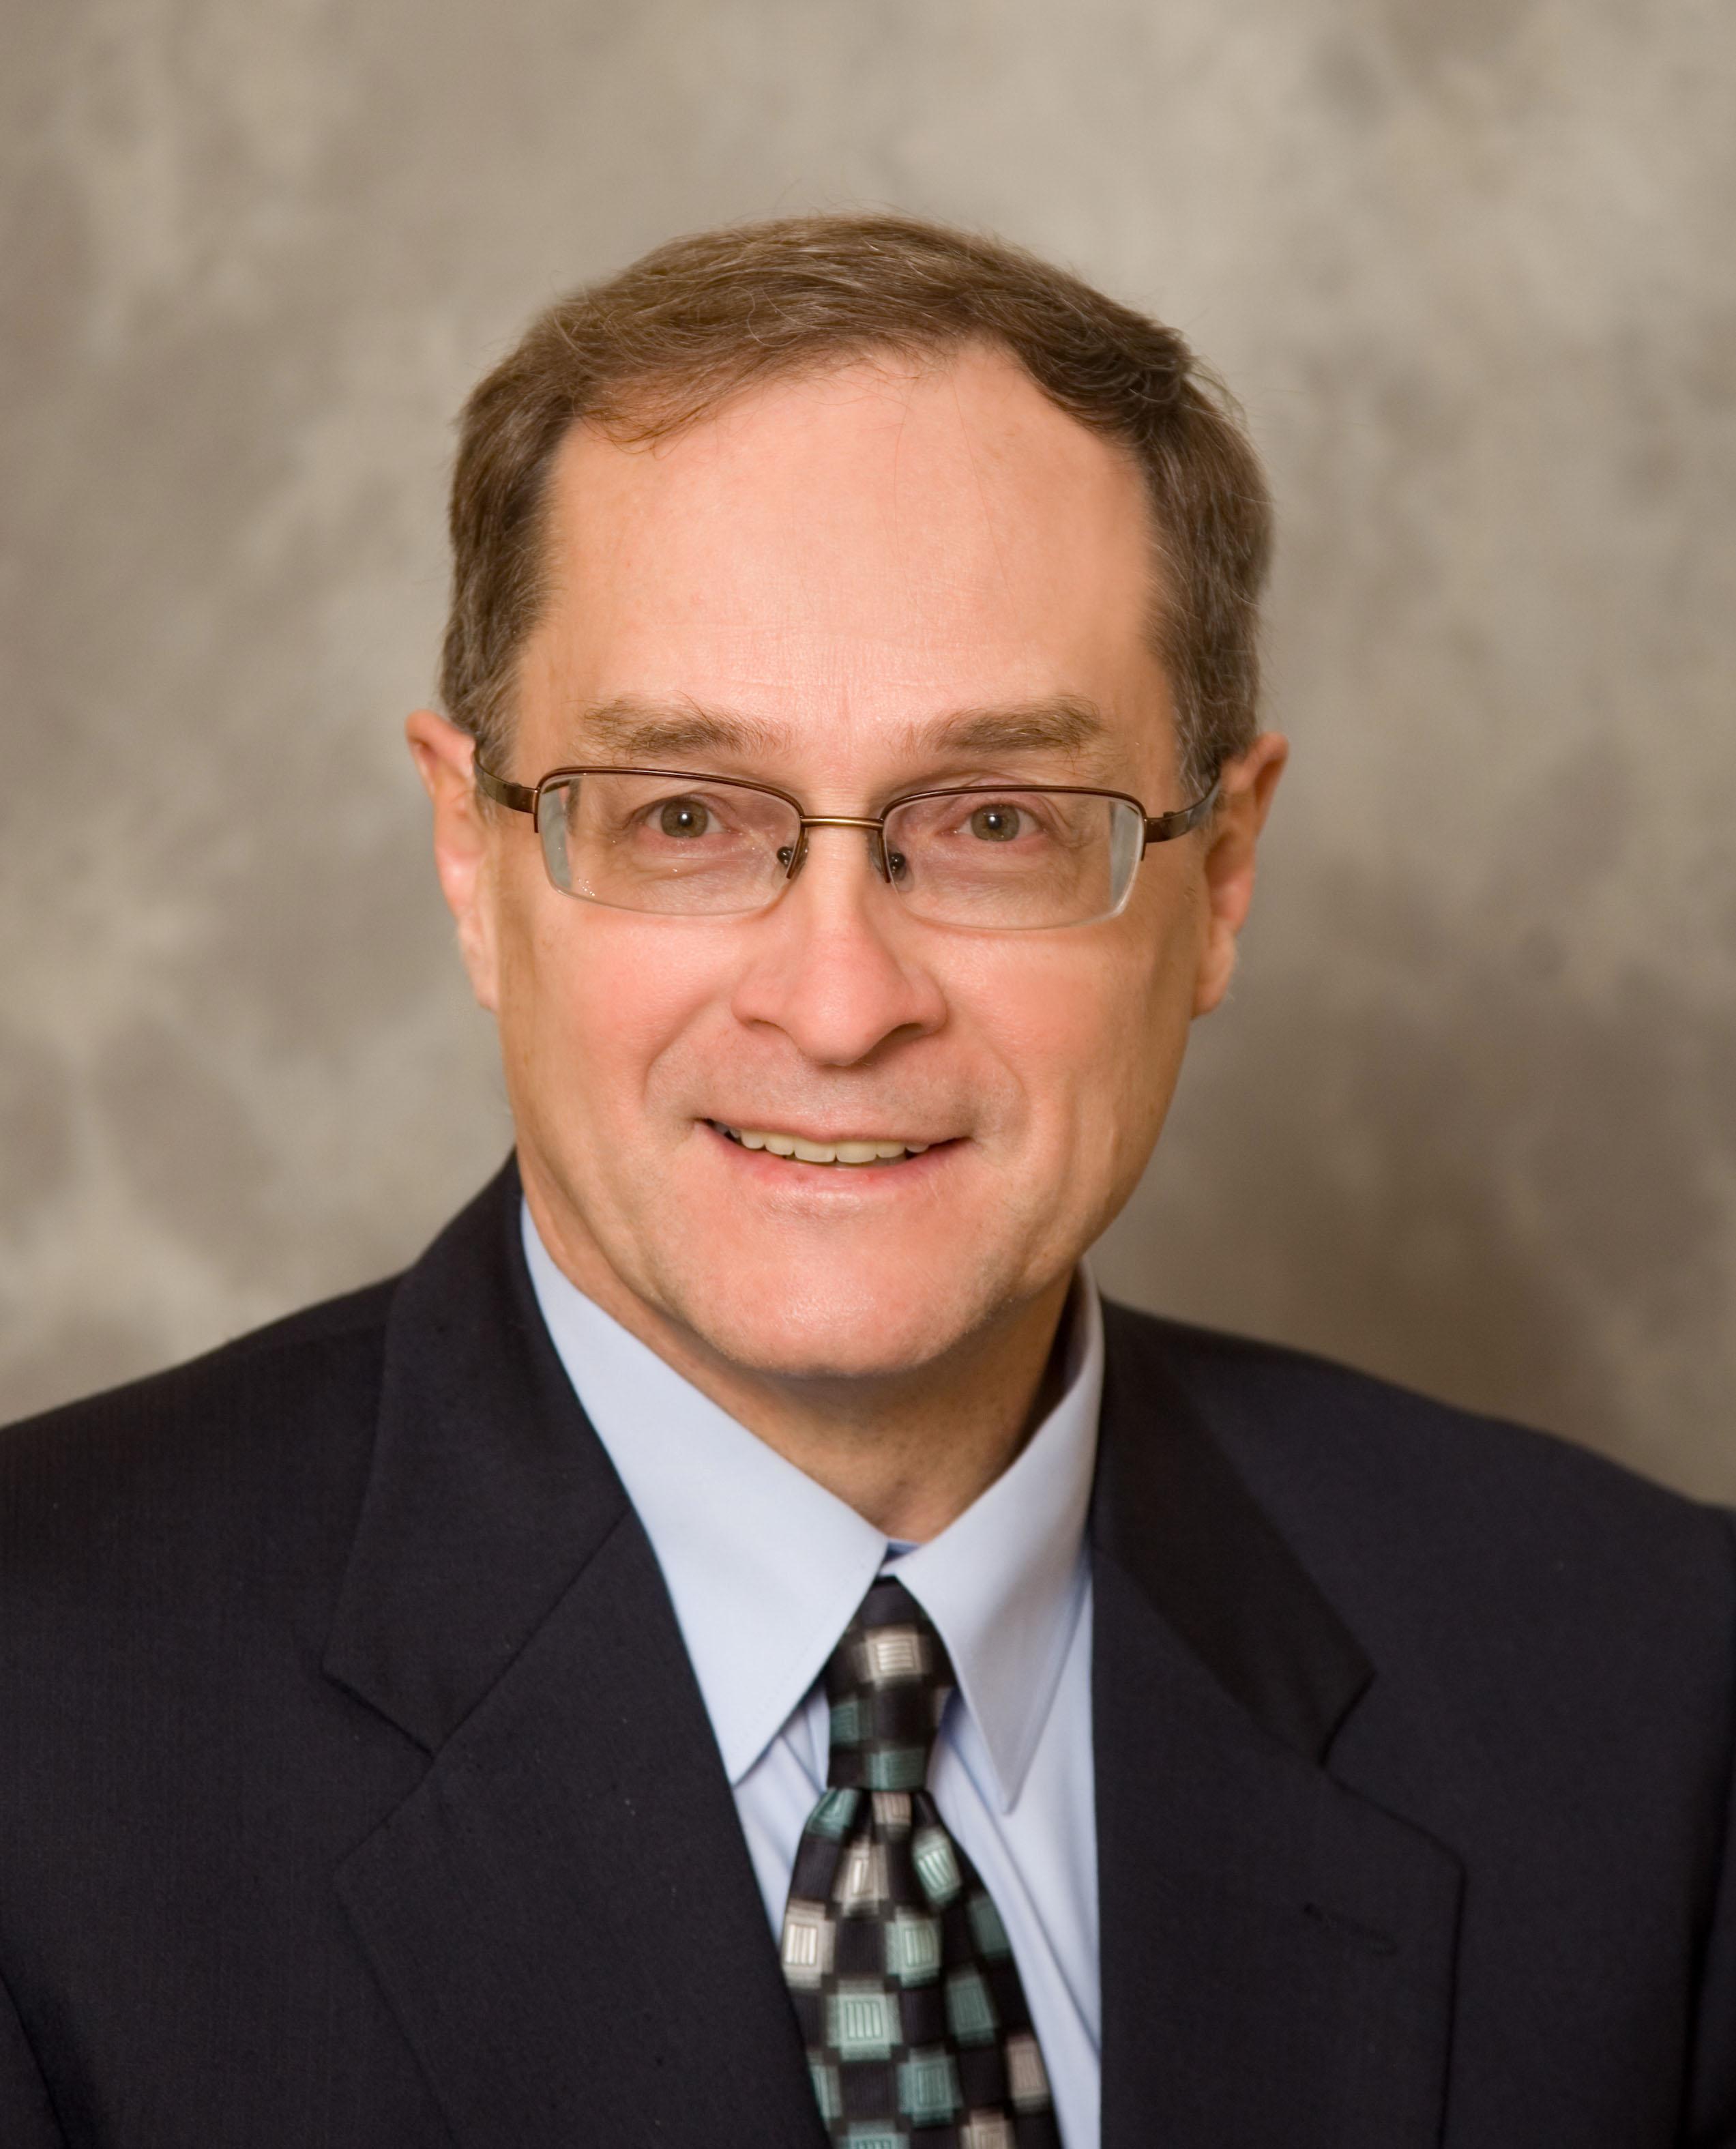 Rick Sauer - Treasurer - Sauk Prairie Healthcare